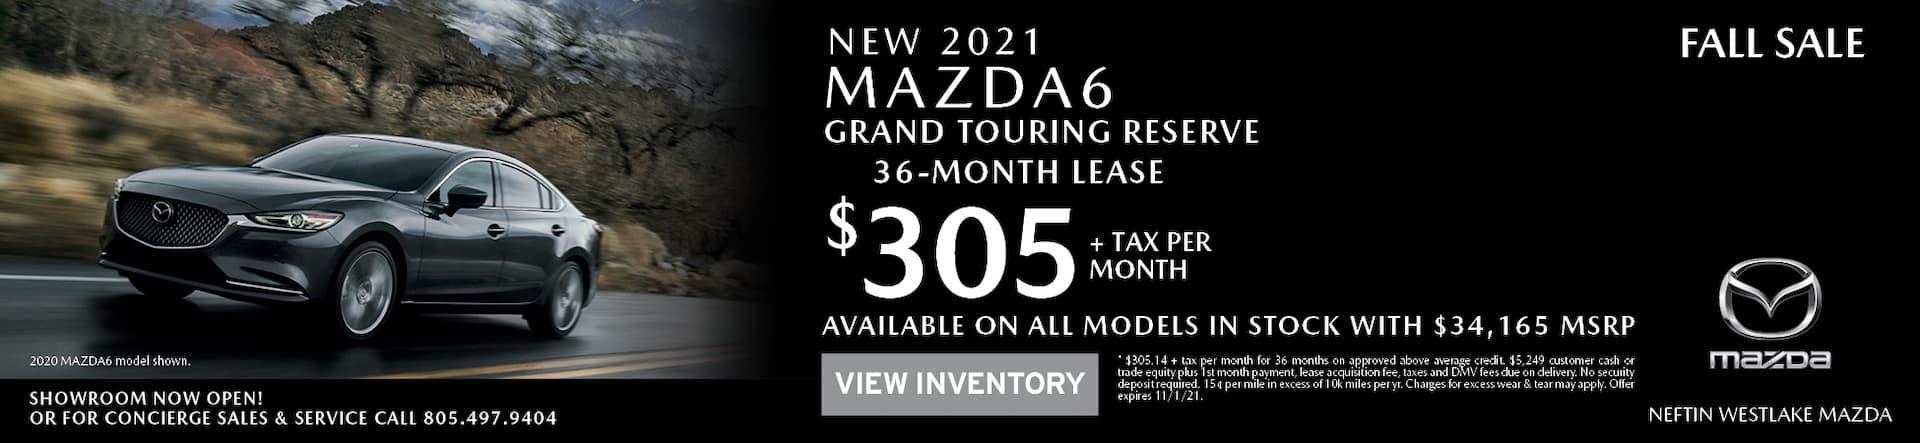 Neftin Westlake Mazda October 2021 Mazda6 Lease Offer